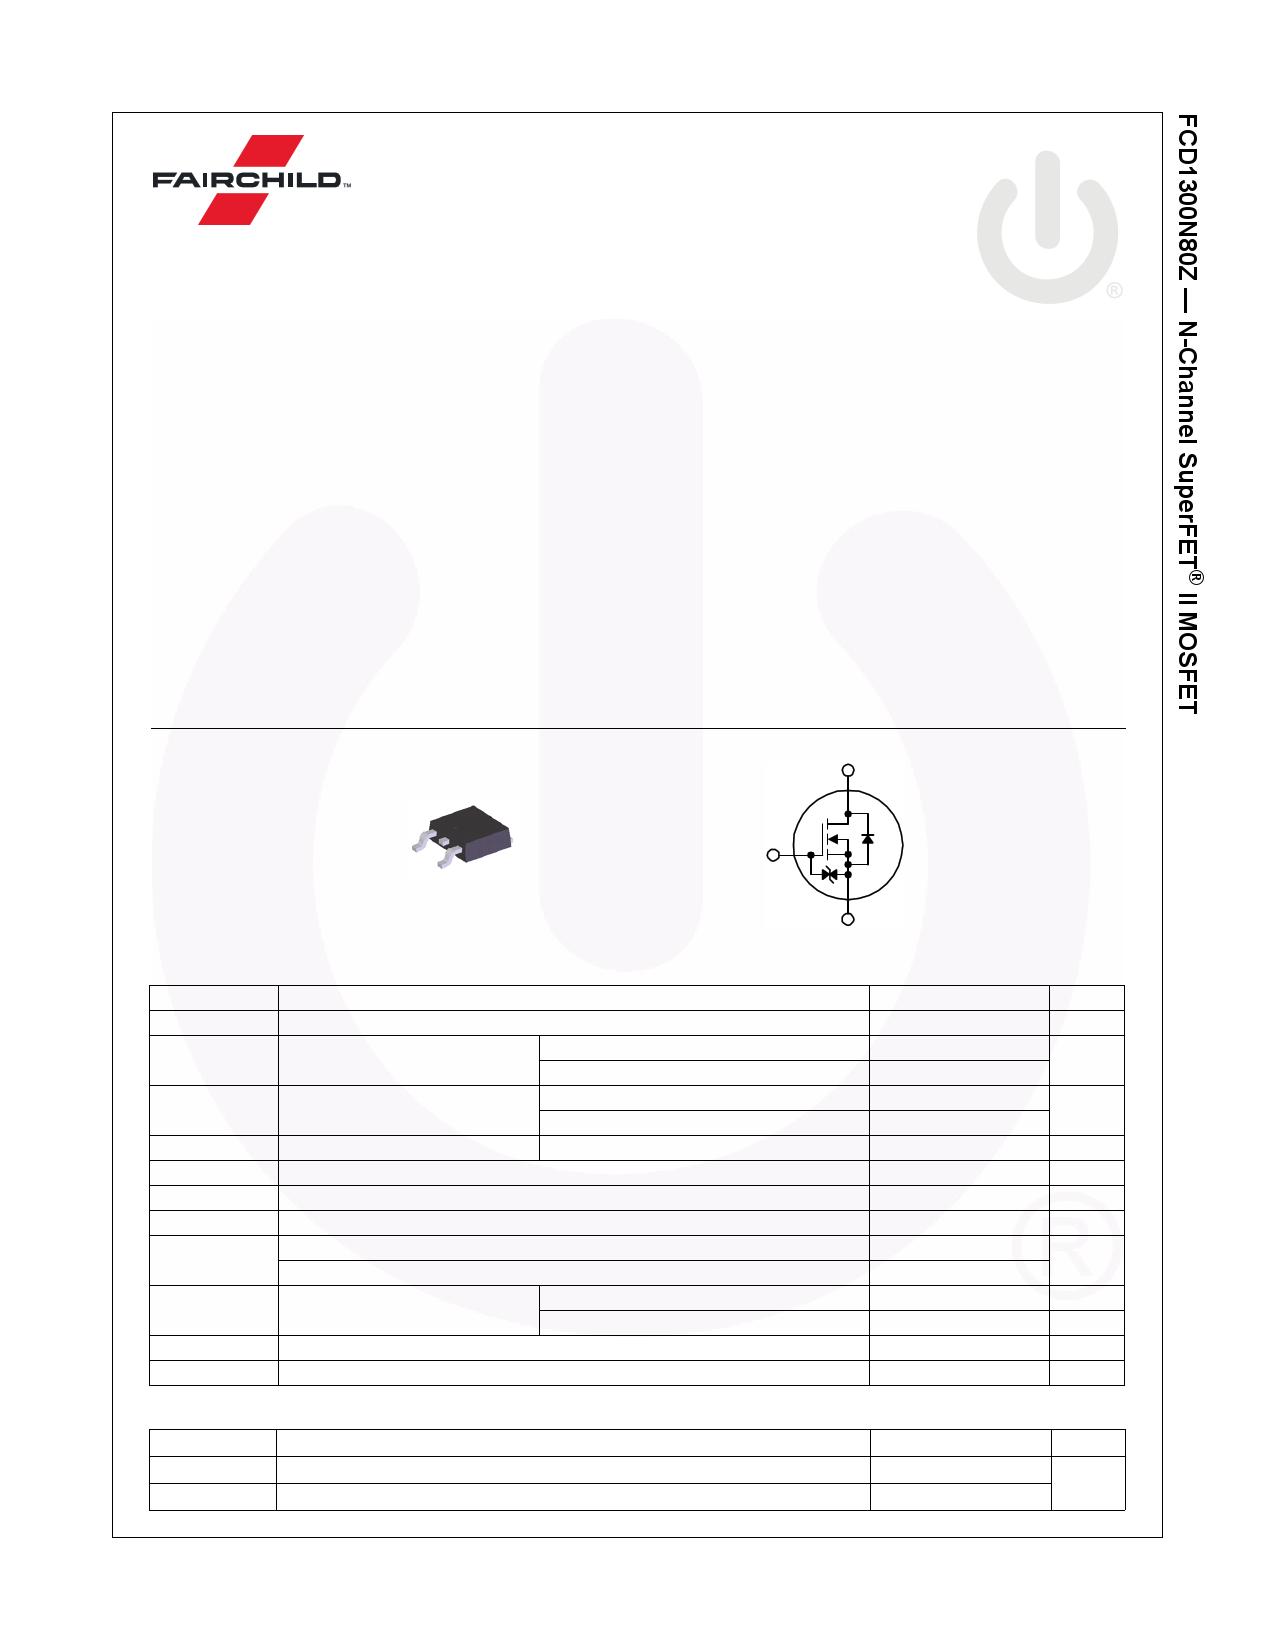 FCD1300N80Z datasheet